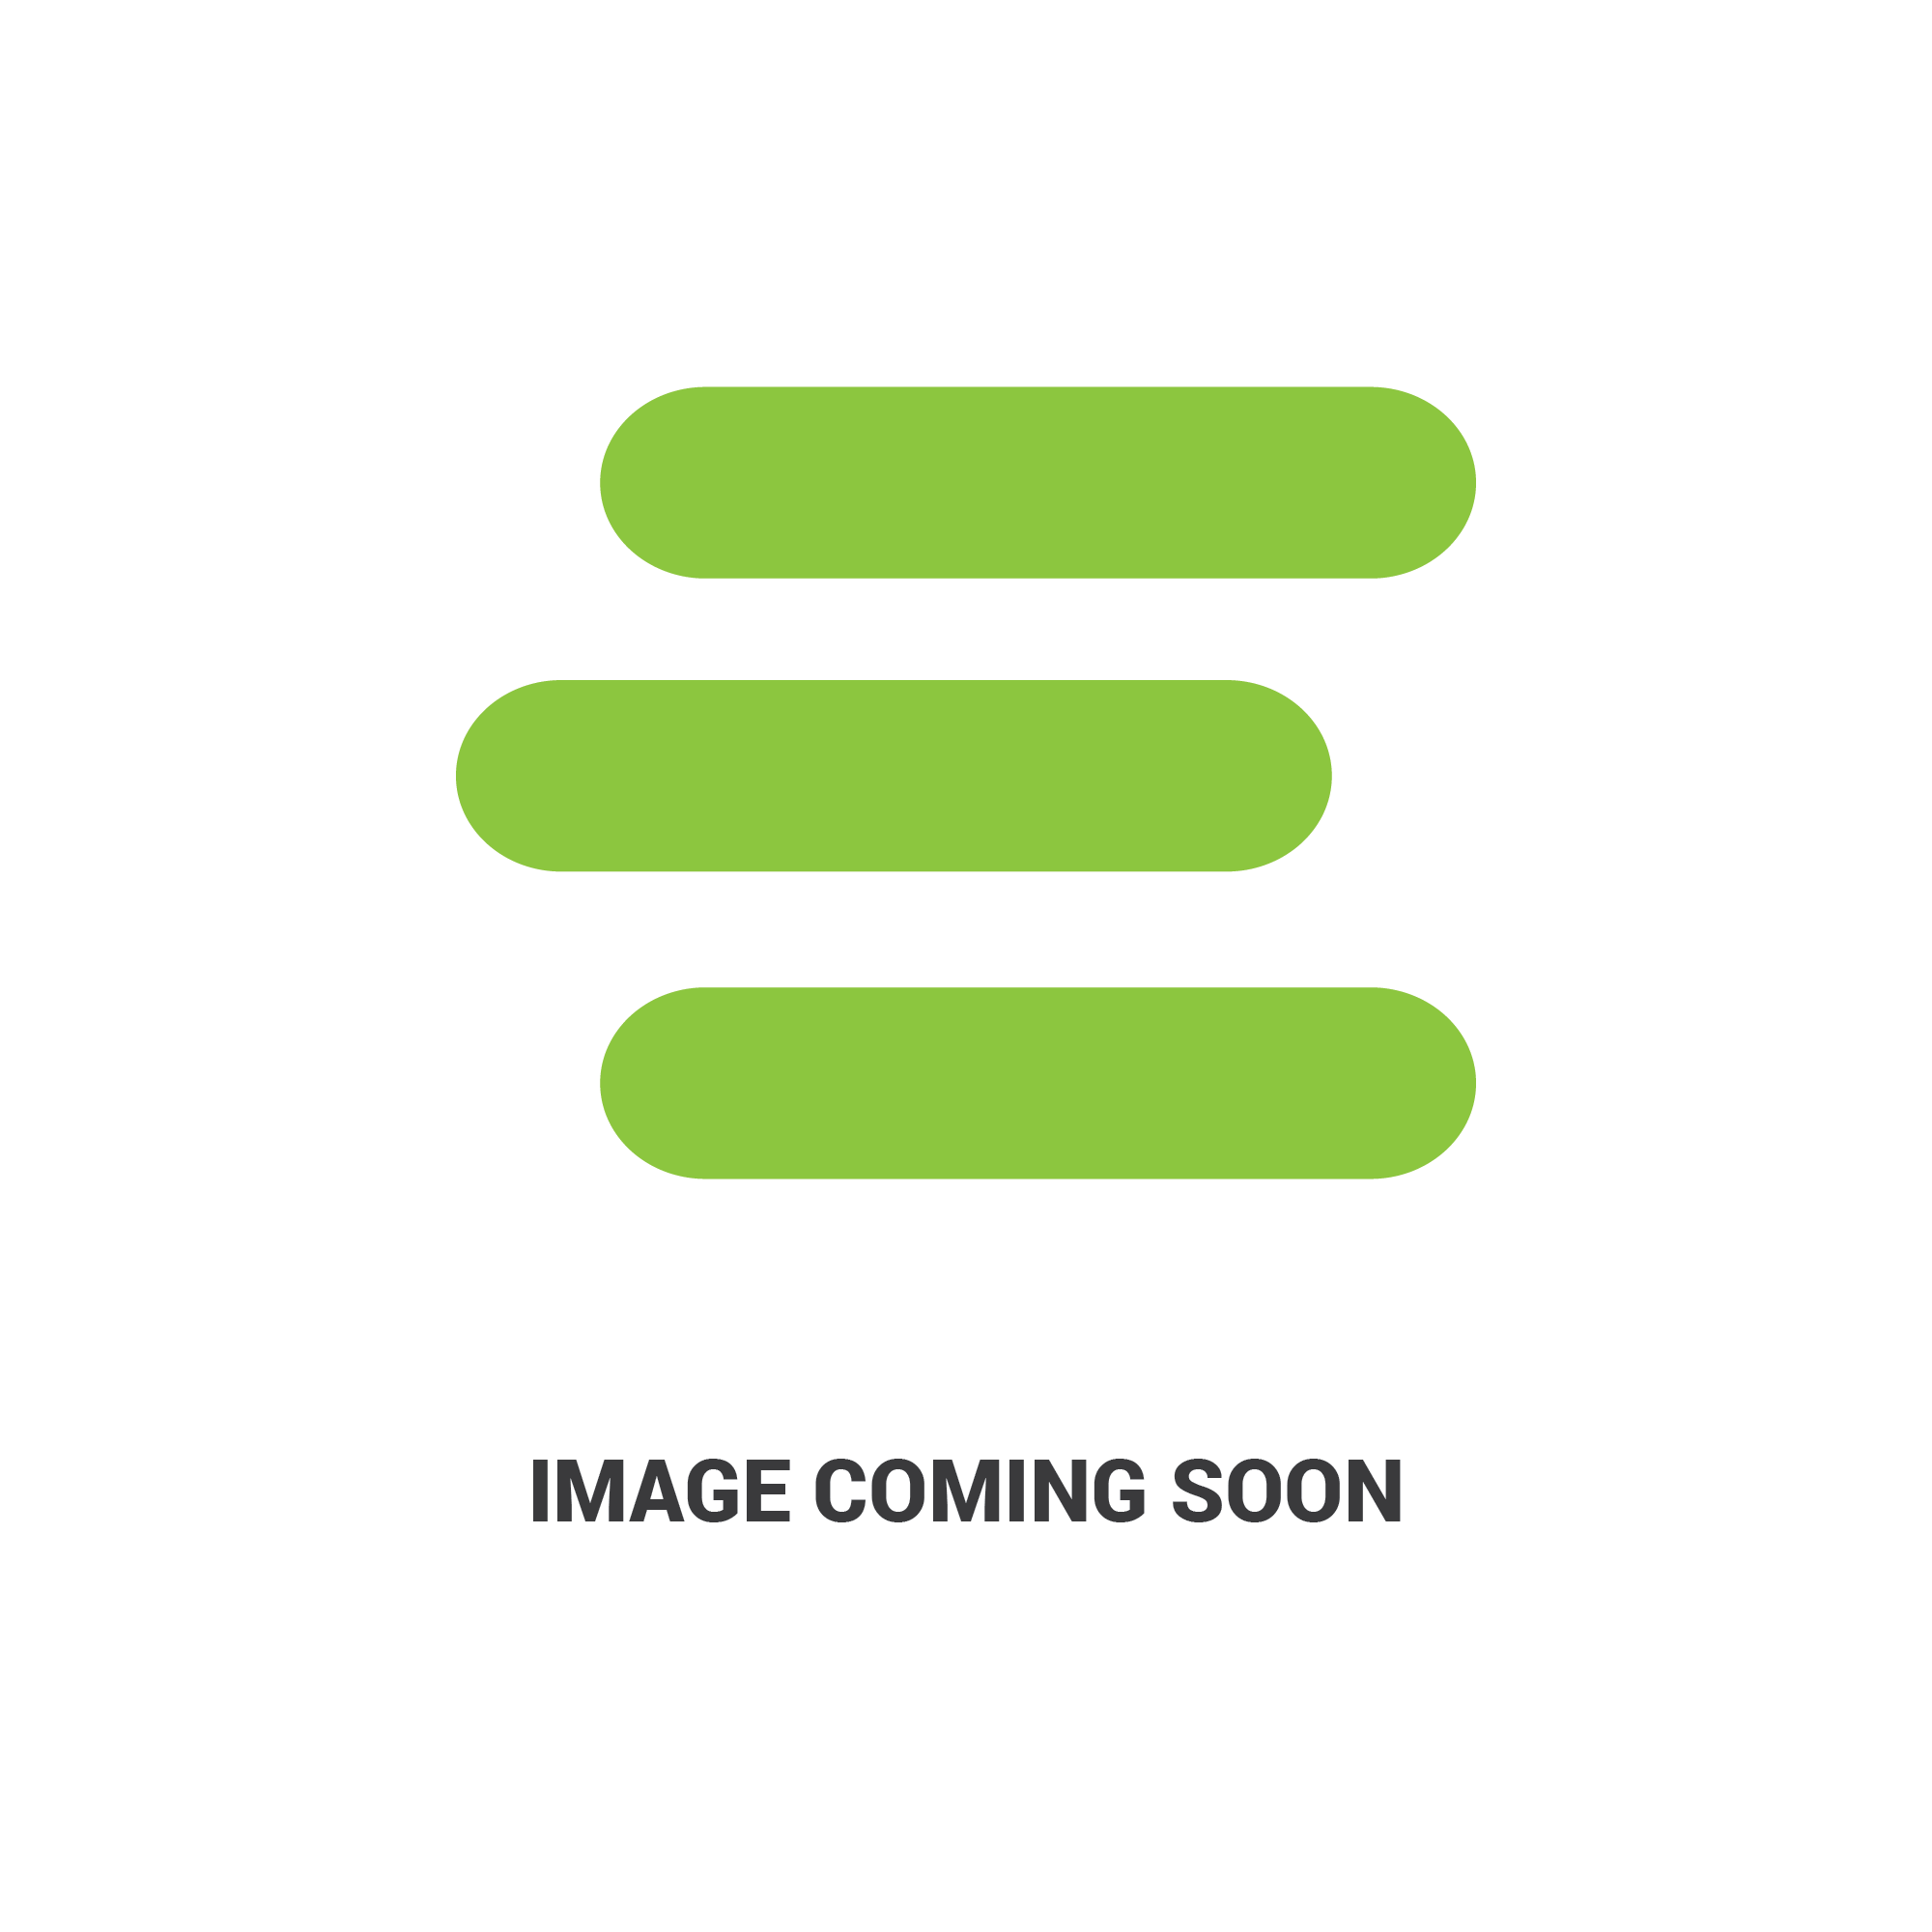 E-6560633edit 1.jpg